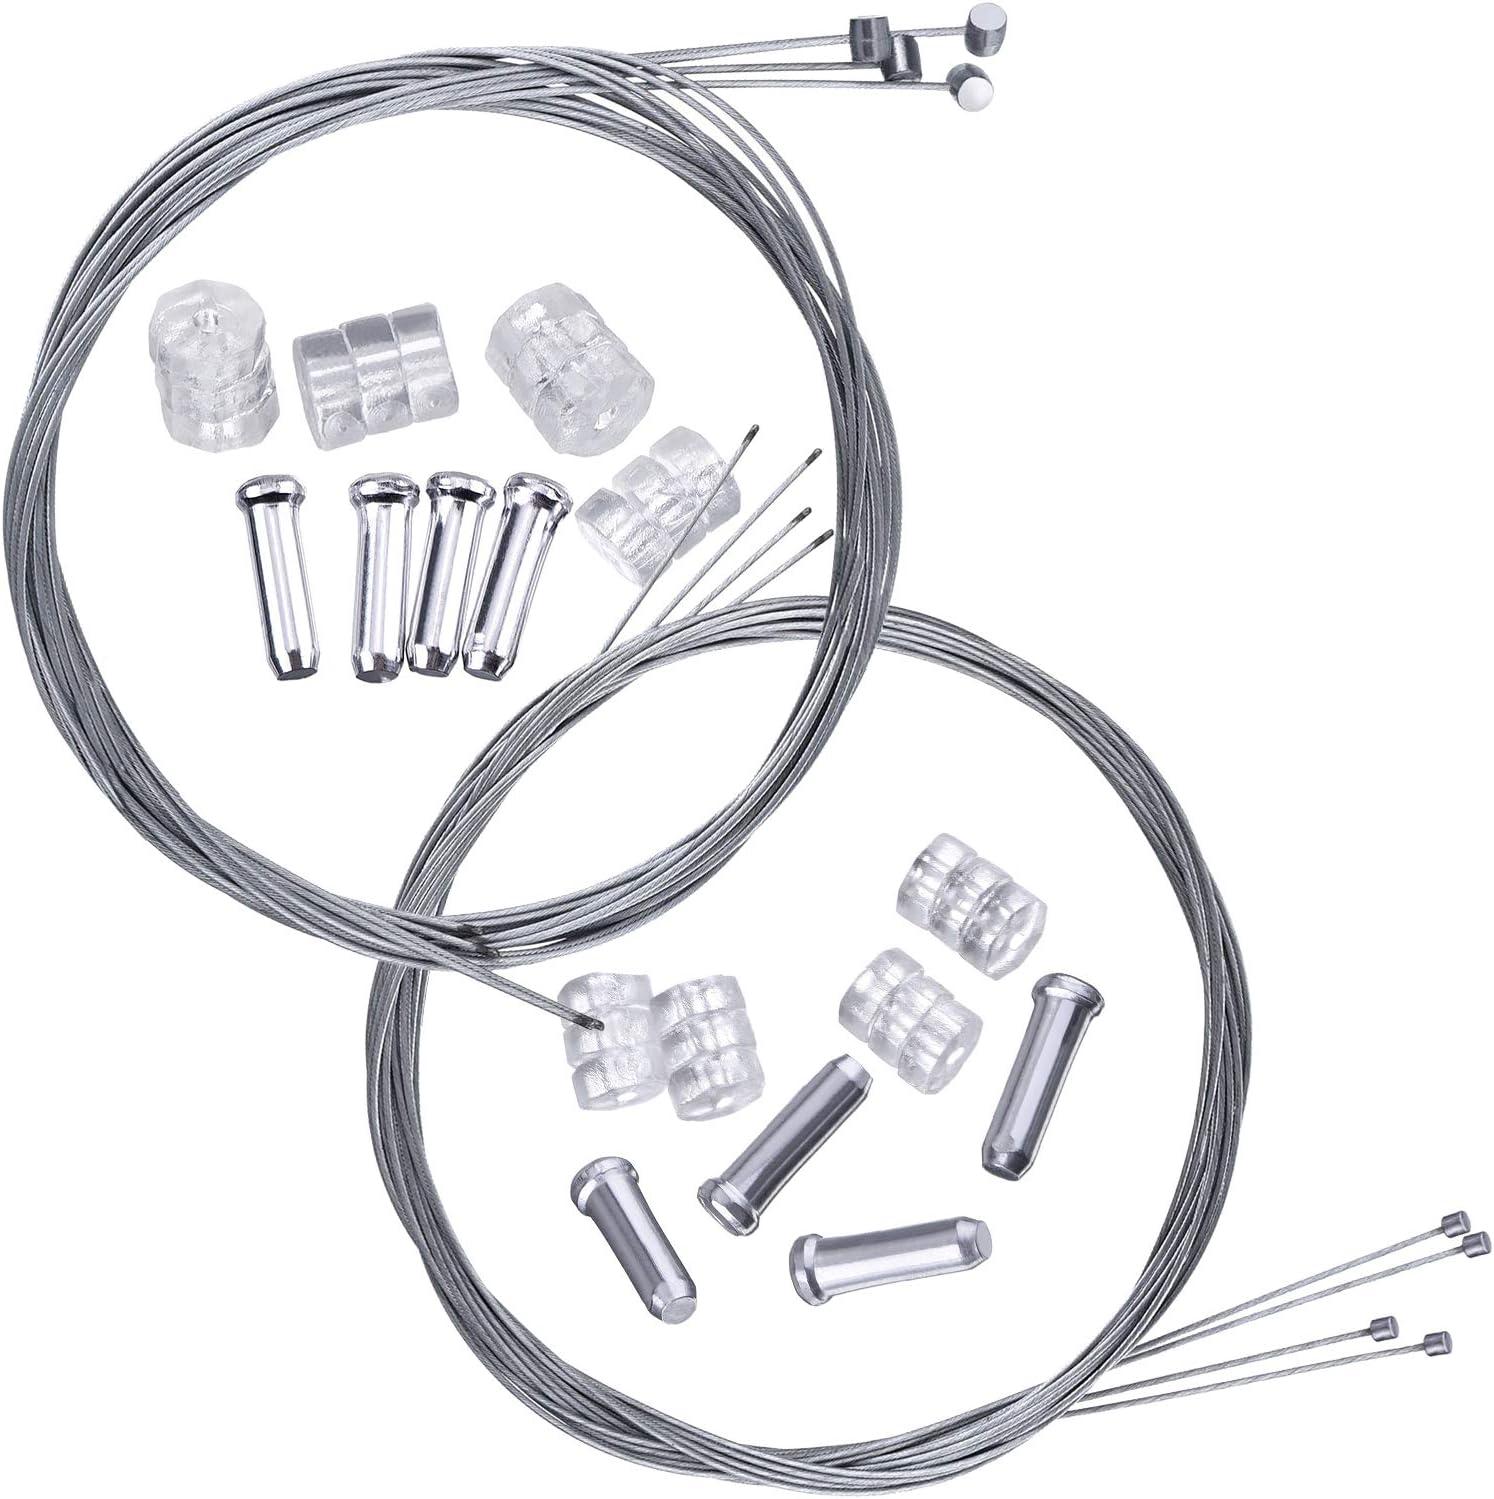 10 X Fahrrad Endkappe Endhülse For Bremsseil Schaltseil Bremszug Schaltzug